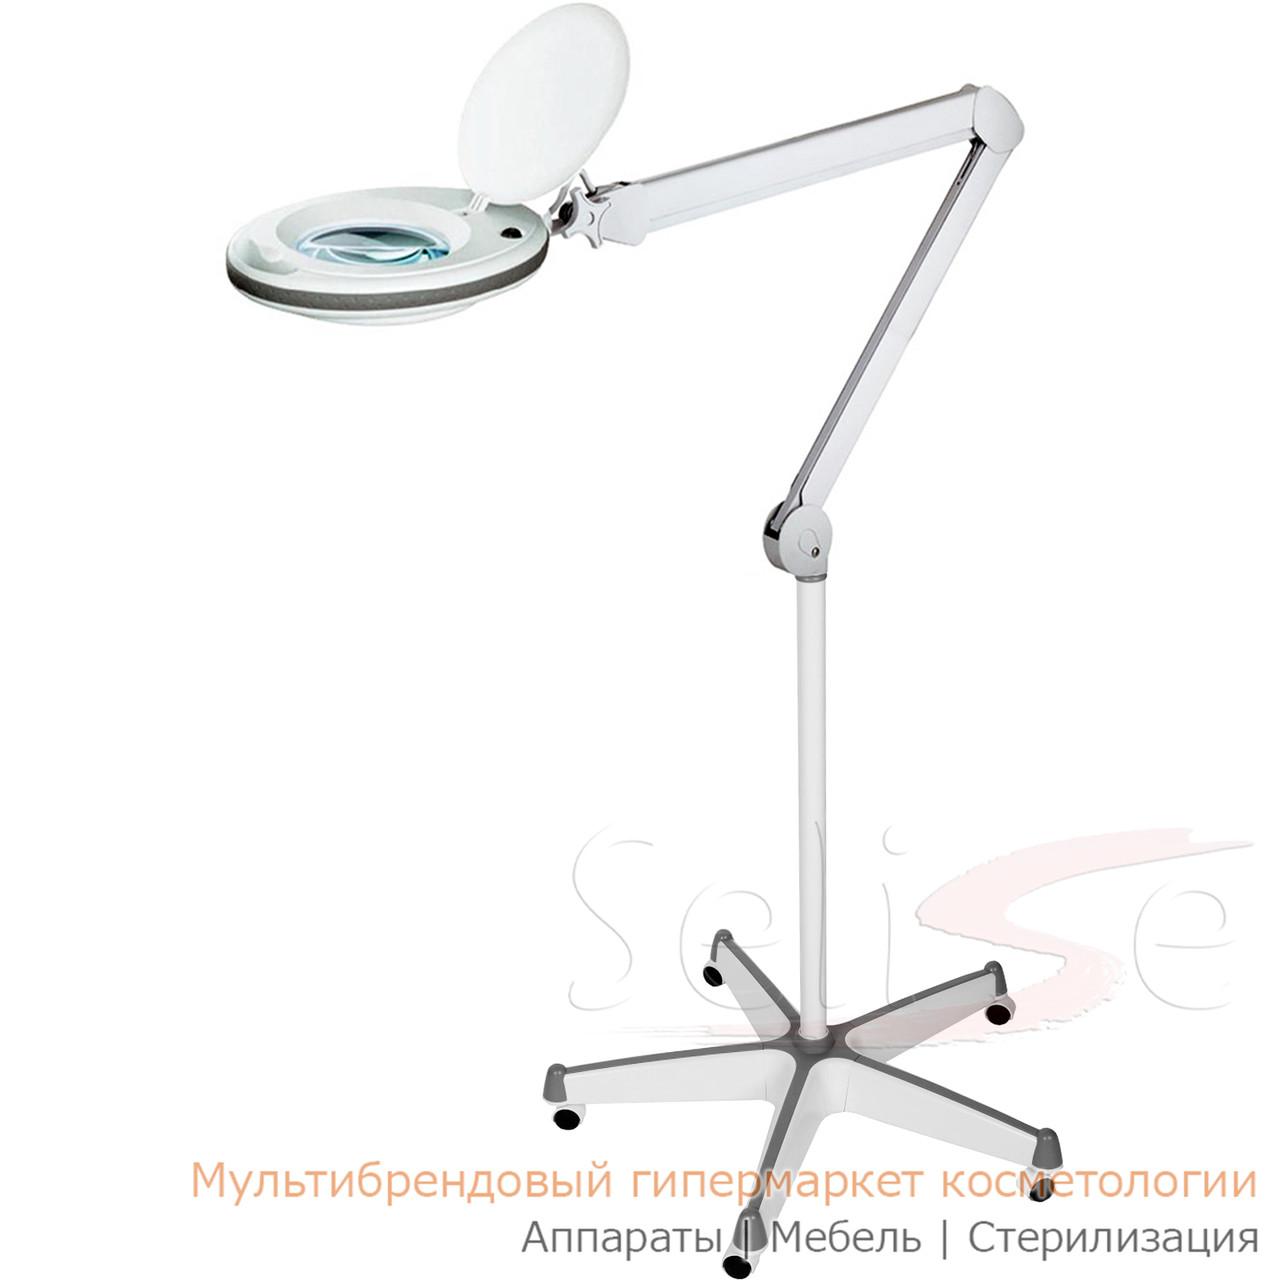 Лампа лупа на штативе 6027 пятилучевой 5А для косметолога, для наращивания ресниц